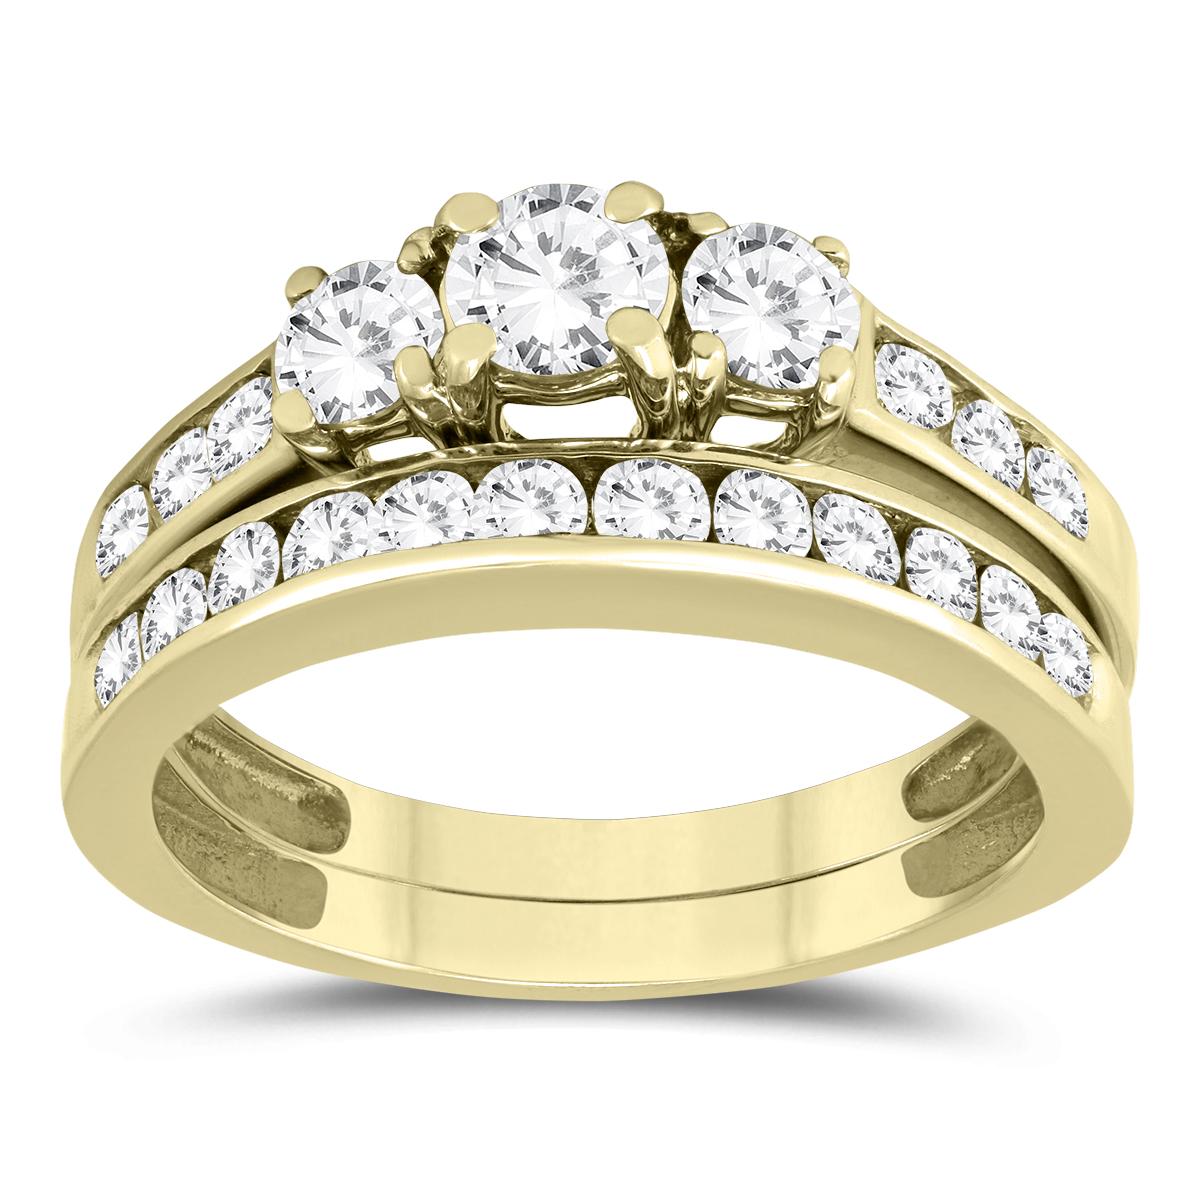 1 1/2 Carat Three Stone Diamond Bridal Set in 10K Yellow Gold